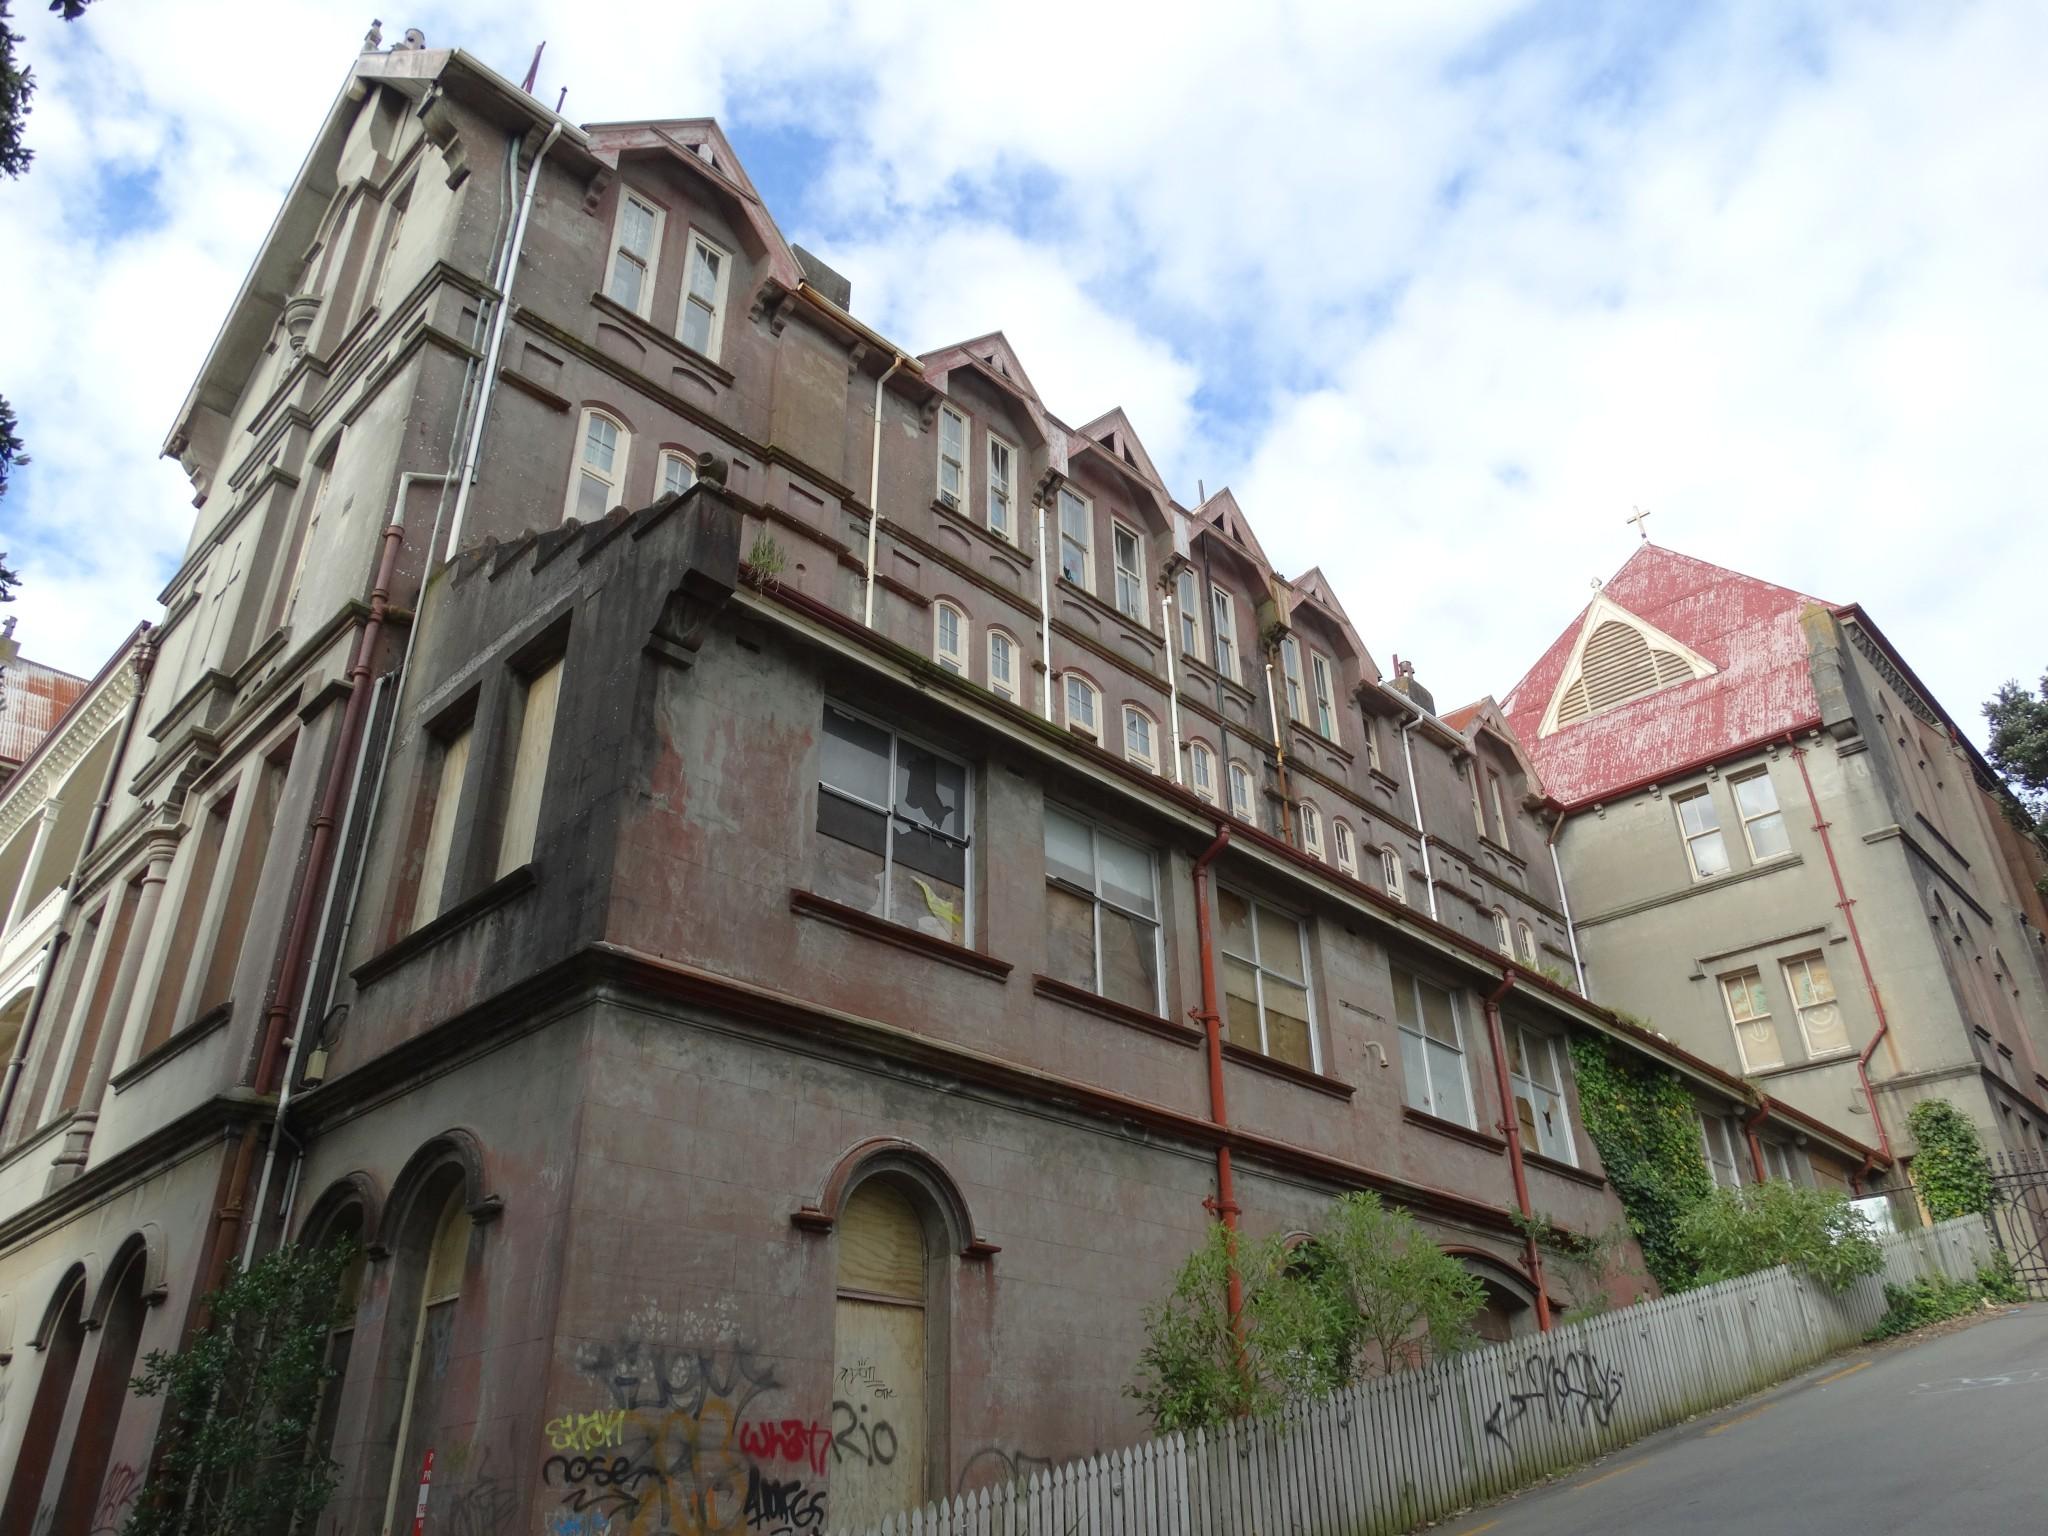 Erskine College, Wellington